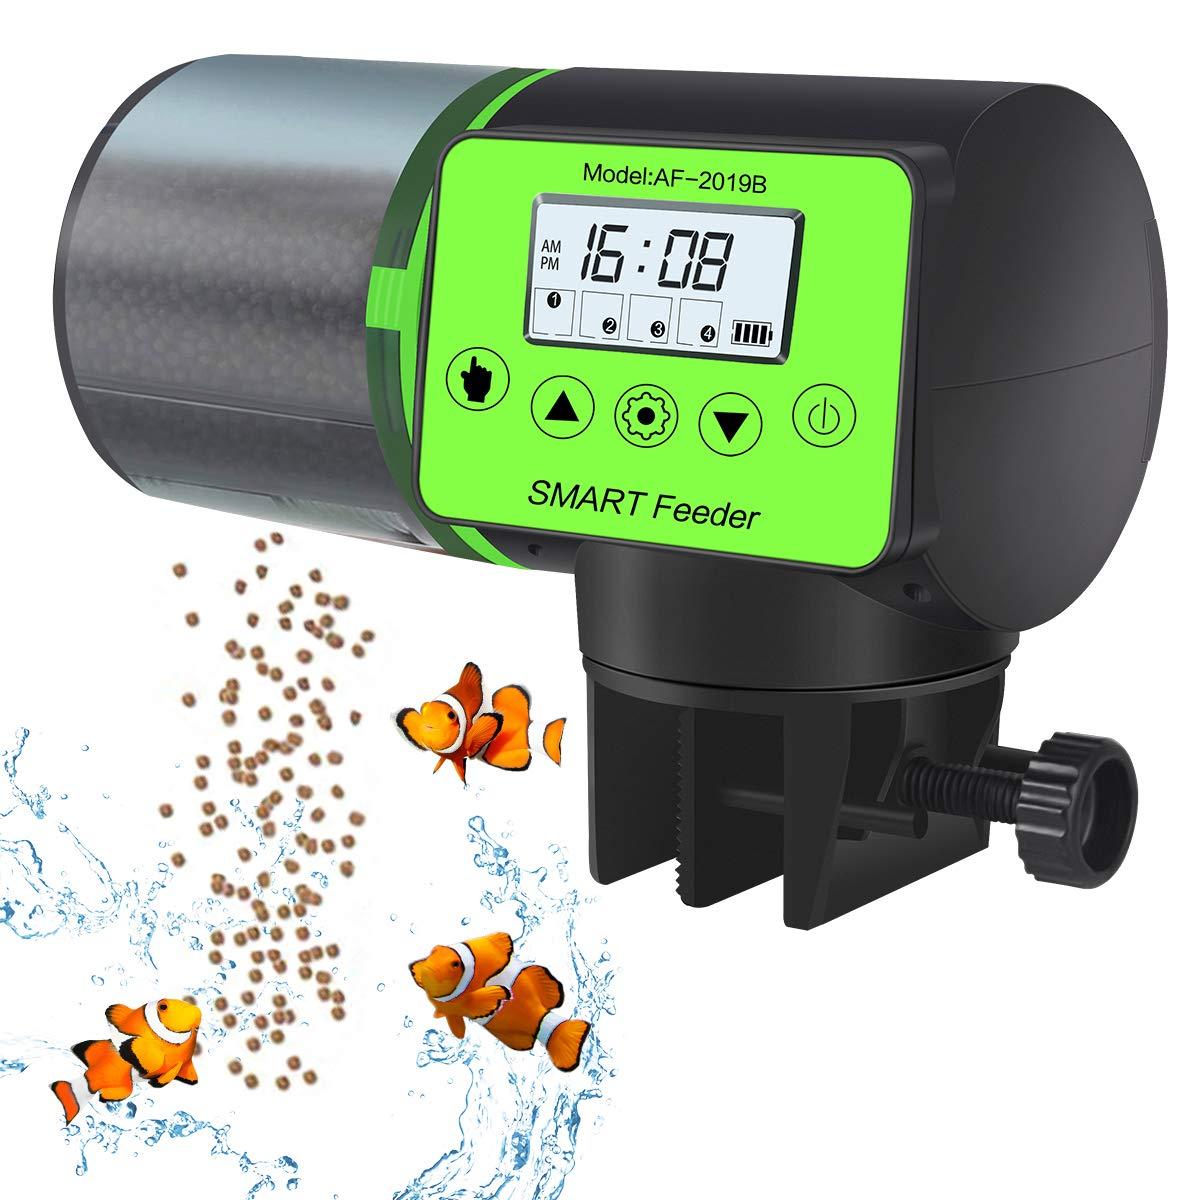 PETRIP Automatic Fish Feeder Update Timer Fish Dispenser Premium Large Capacity 200ML Fish Food Dispenser for Aquarium or Fish Tank by PETRIP